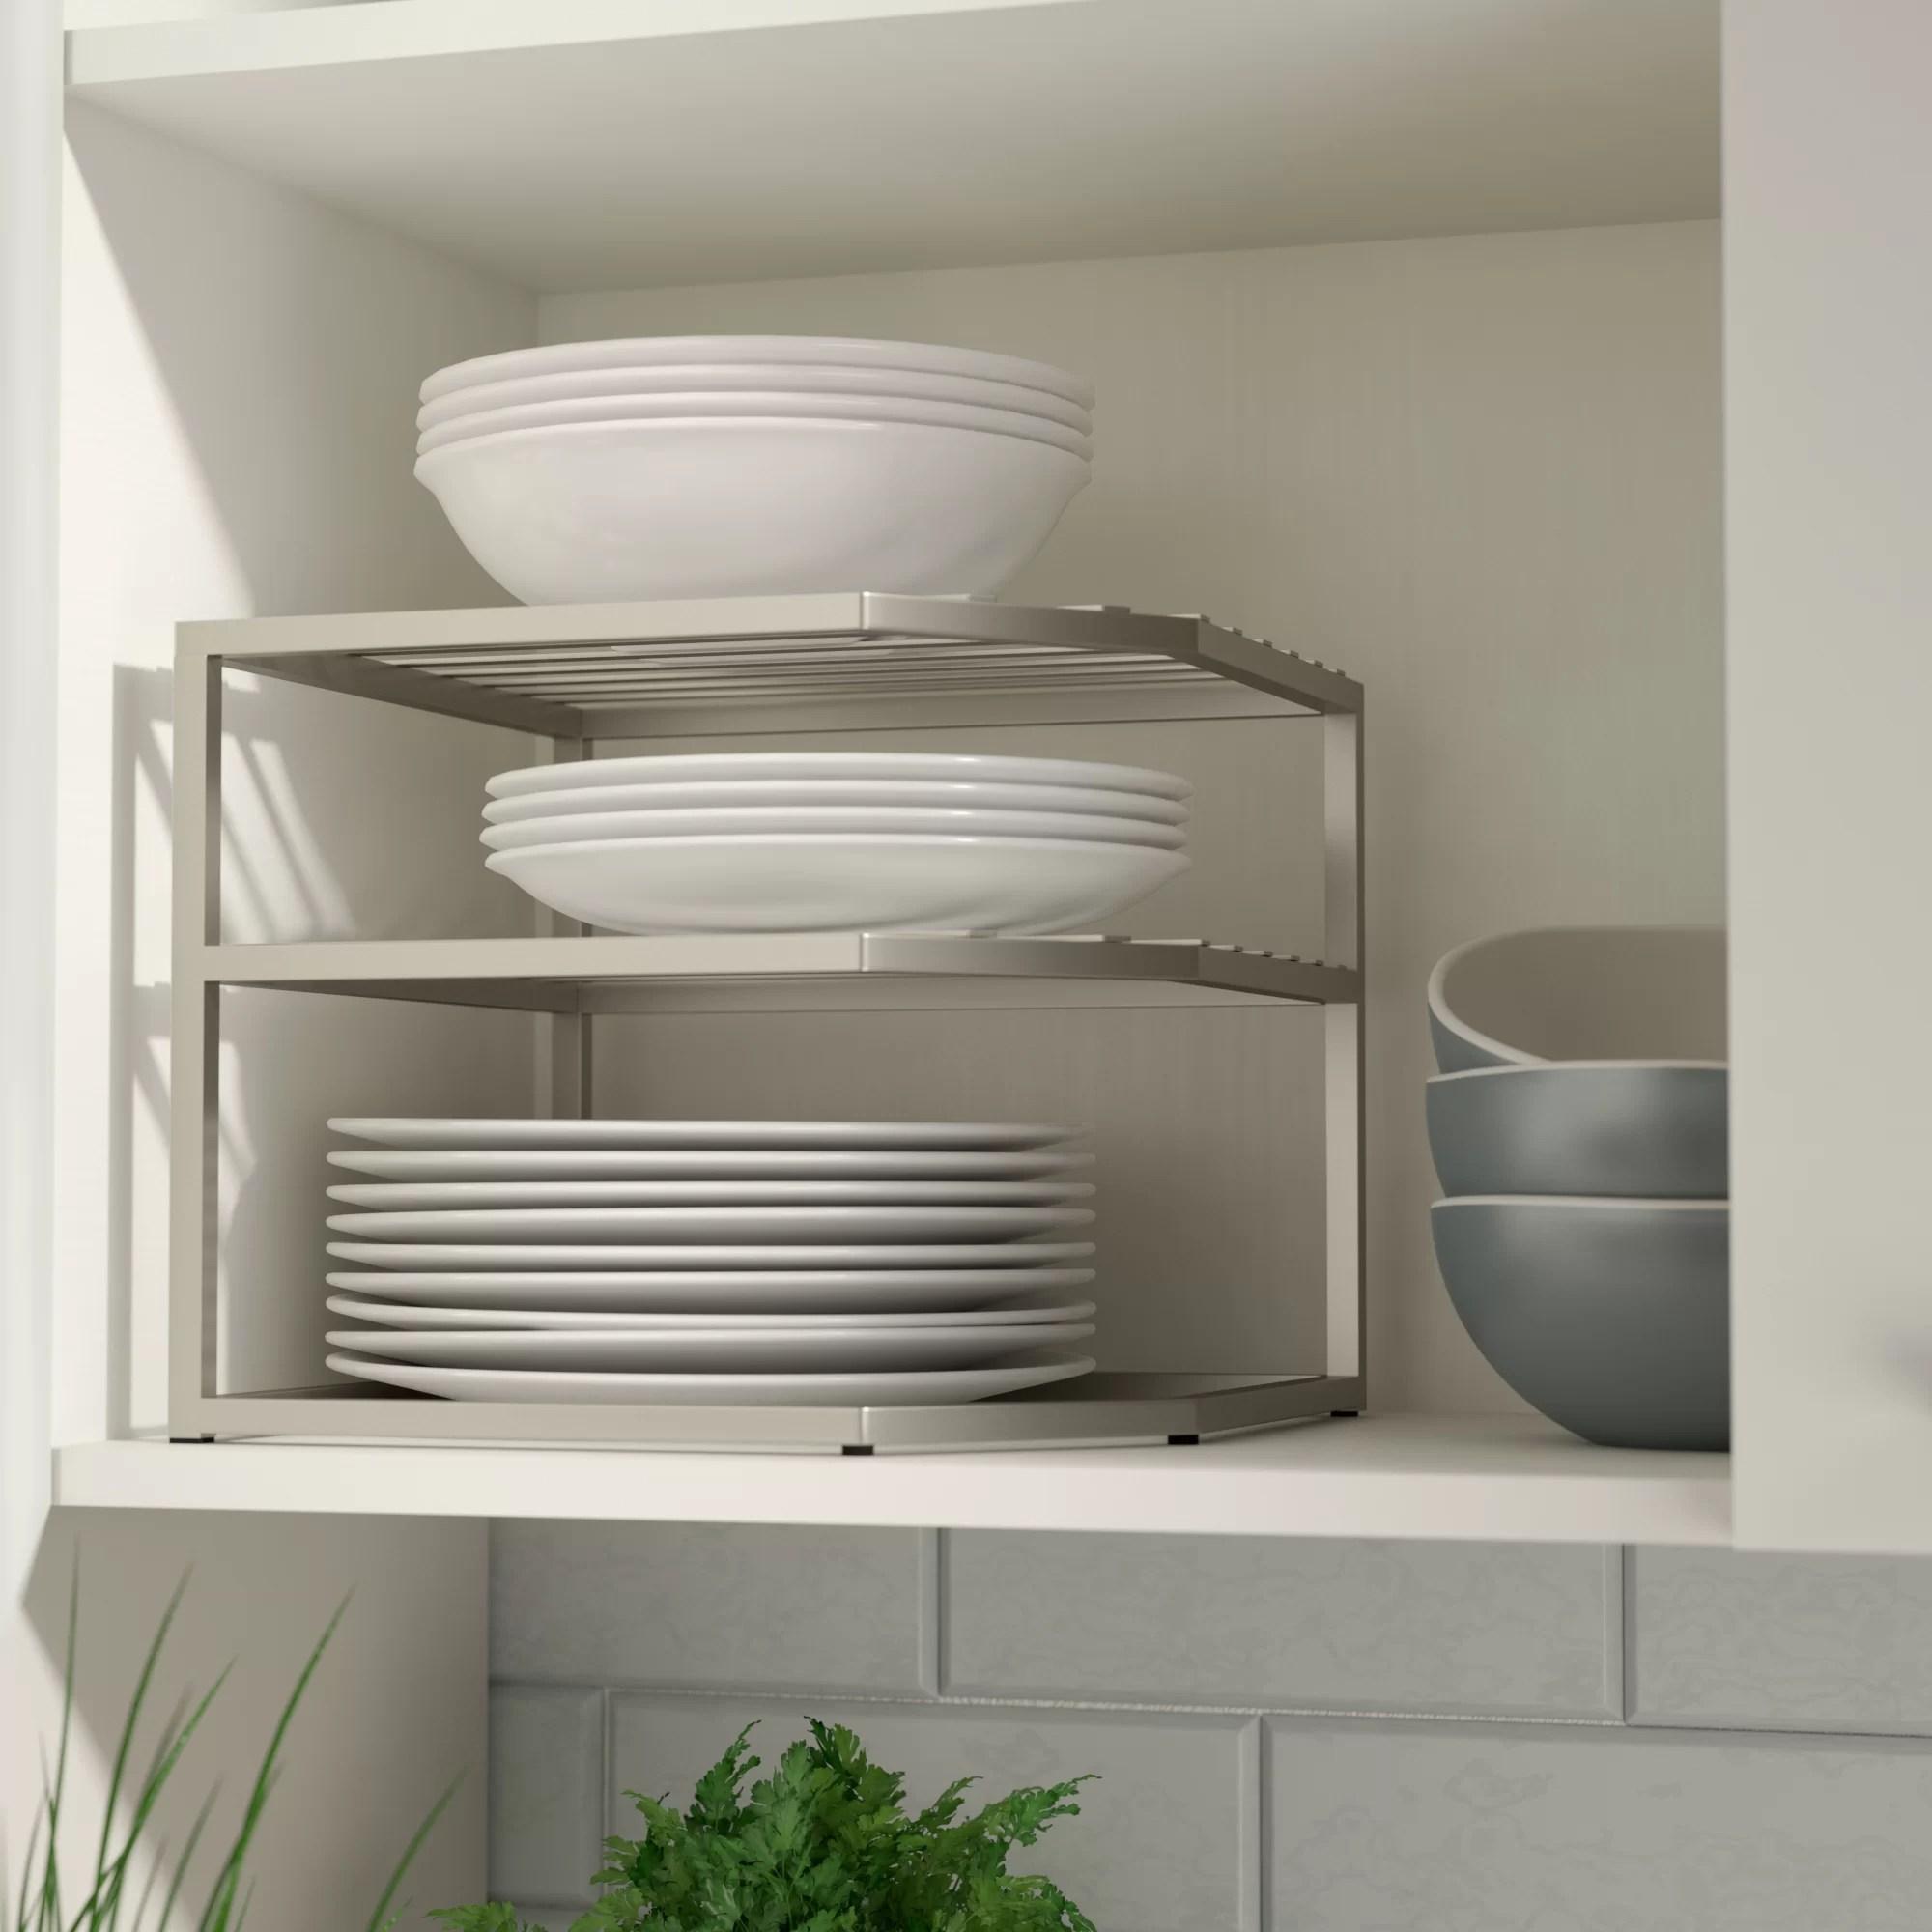 Rebrilliant Prevatte Corner Kitchen Cabinet Organizer Shelving Rack Reviews Wayfair